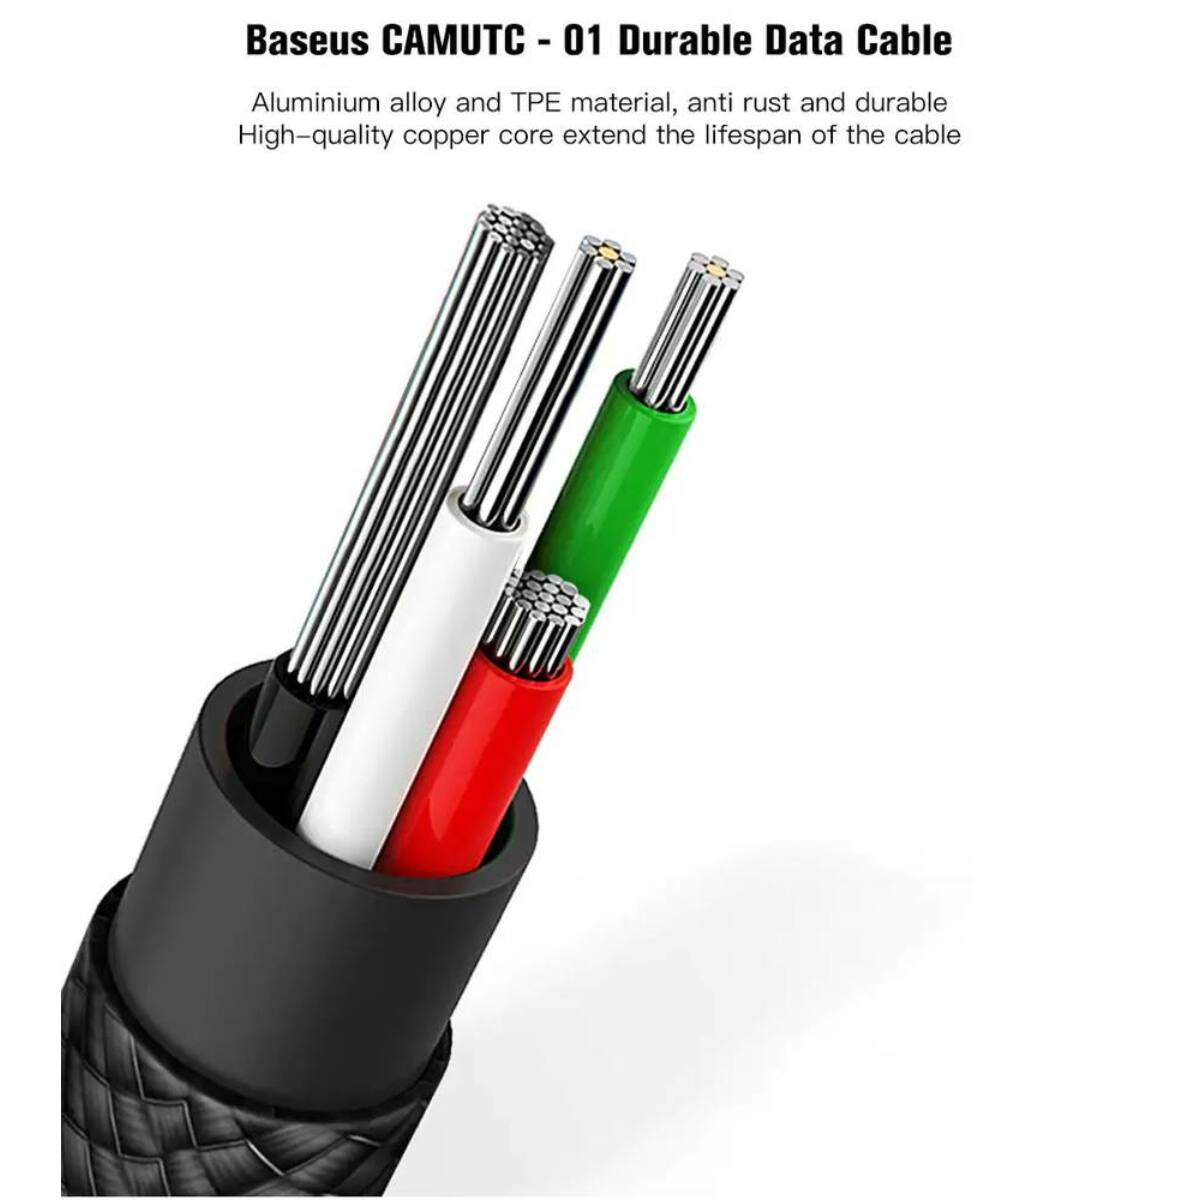 Baseus Univerzális kábel, U-shaped, 2-in-1 multifunkciós(Type-C + micro USB), U forma, 0.23m, 2.4A, fekete (CAMUTC-01)